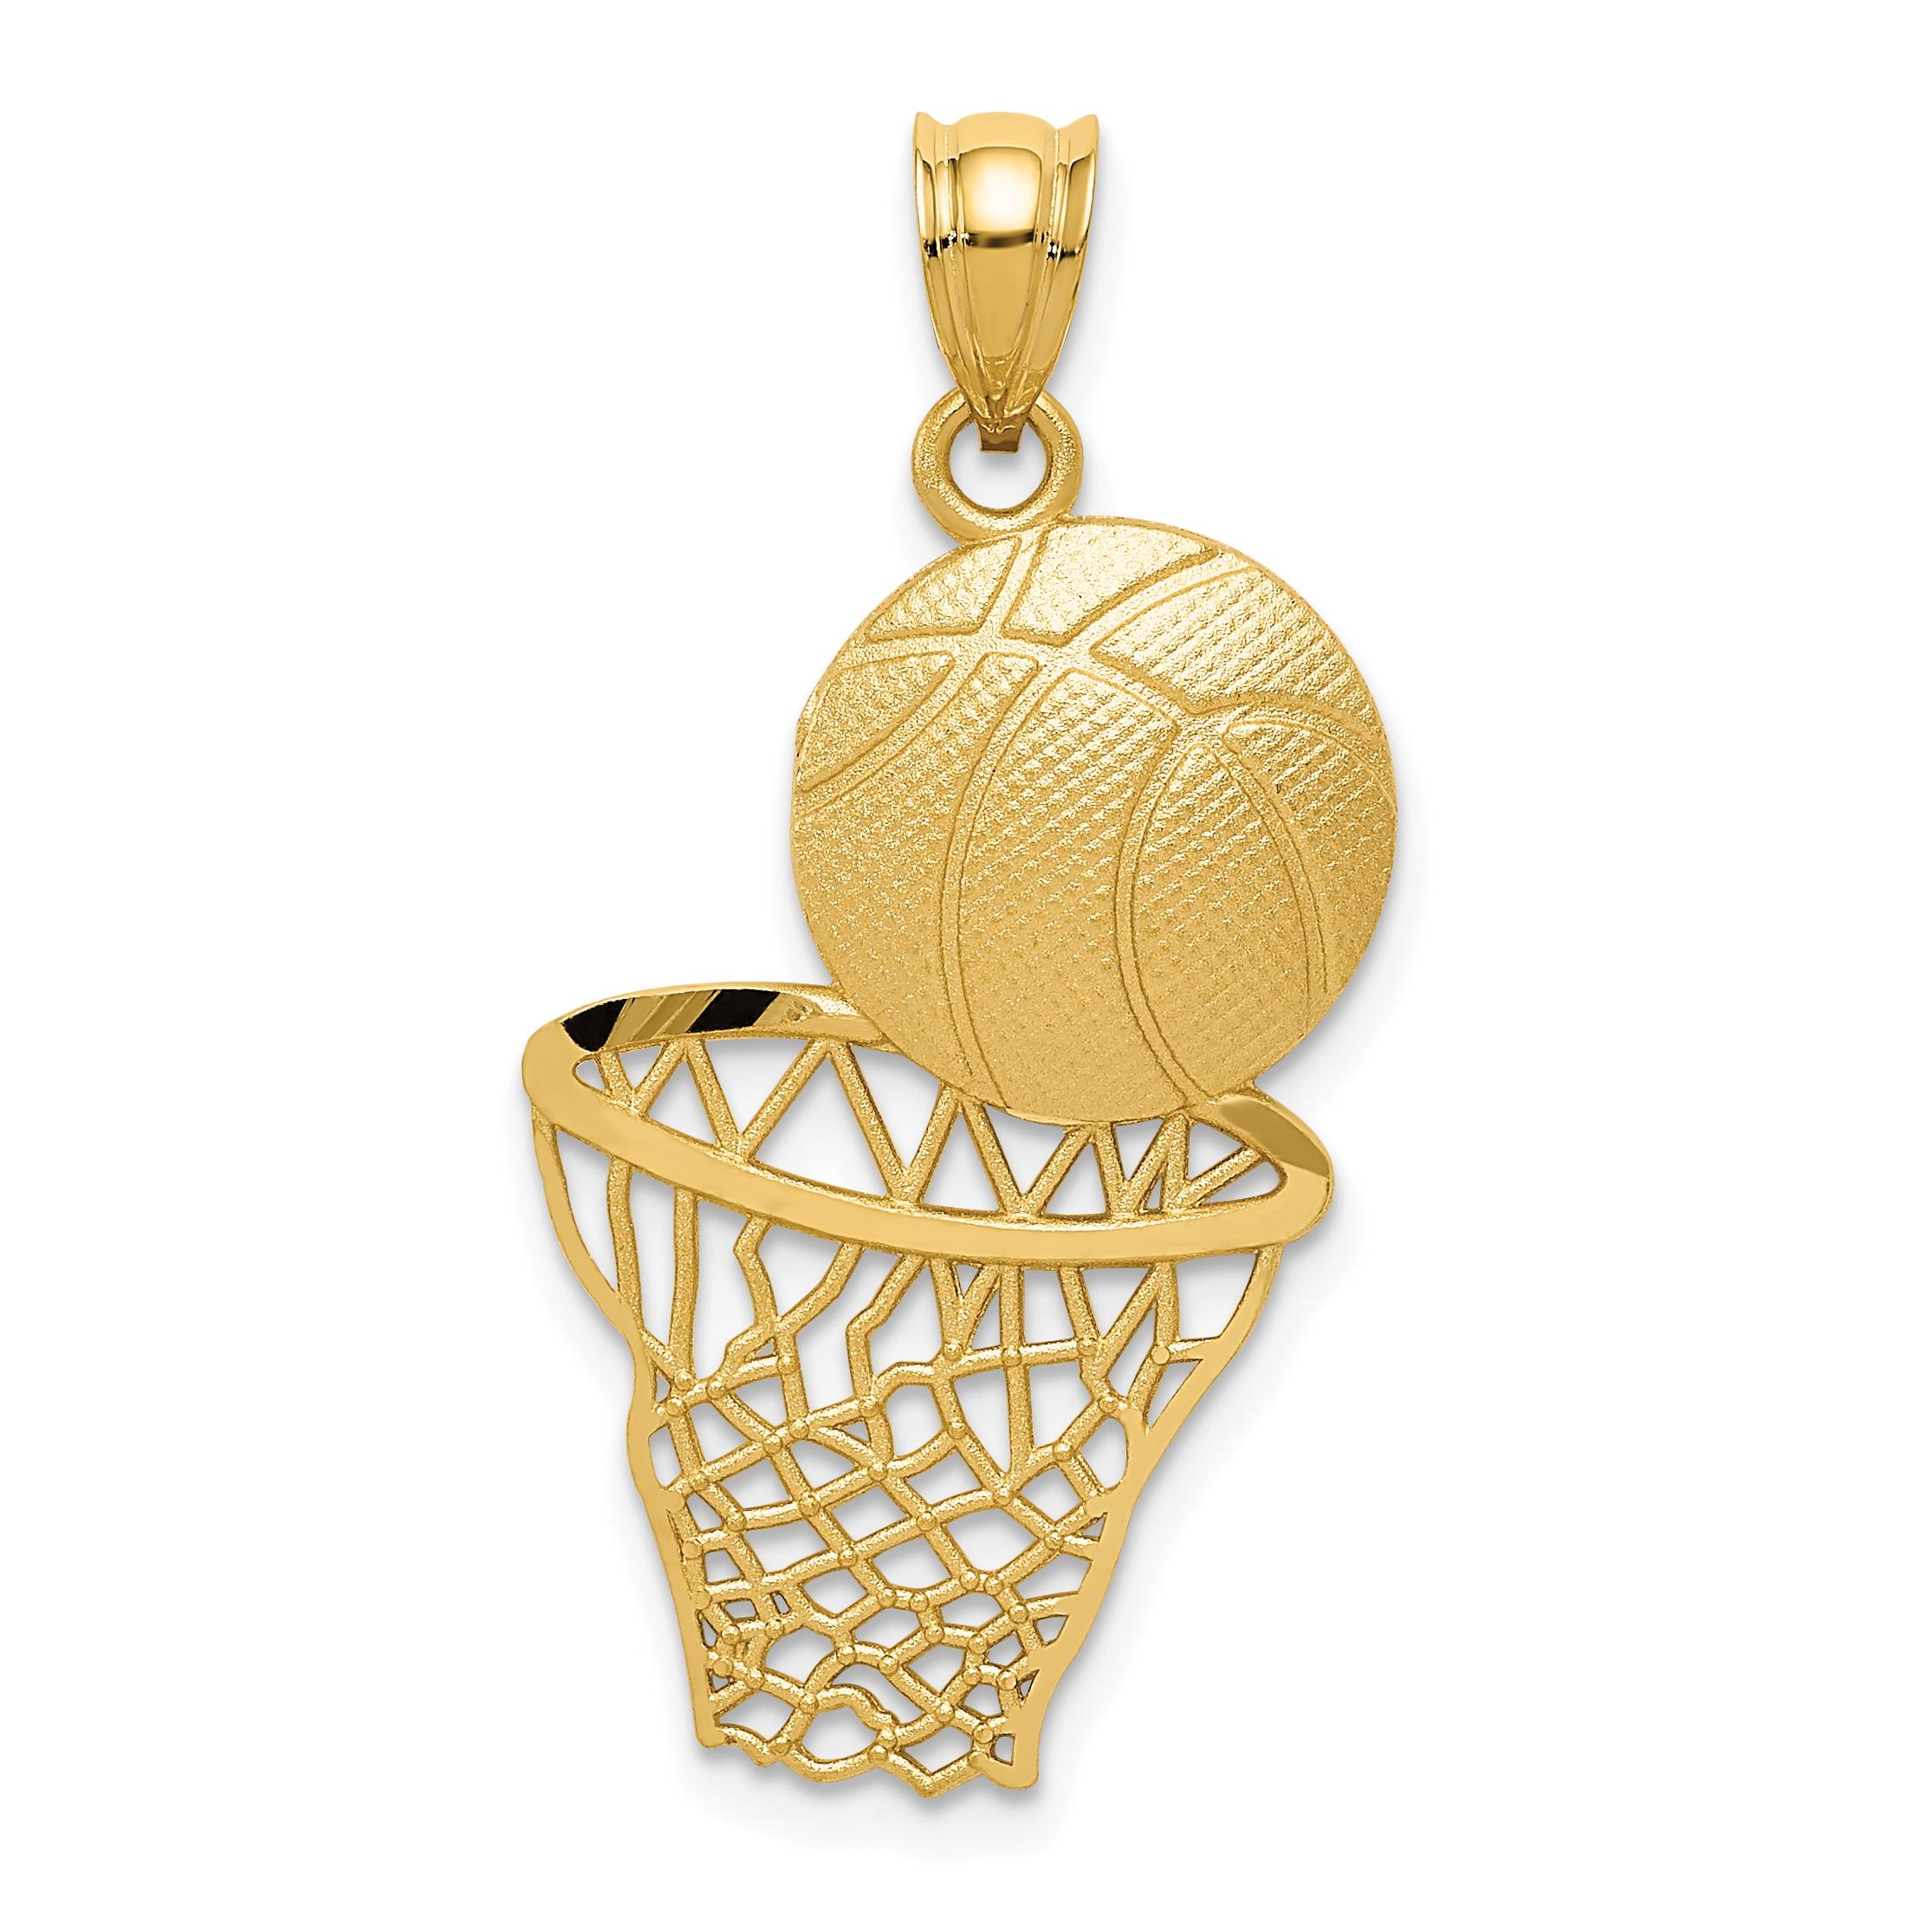 a43618629d301 14k Yellow Gold Basketball Net Pendant Charm Necklace Sport Man ...